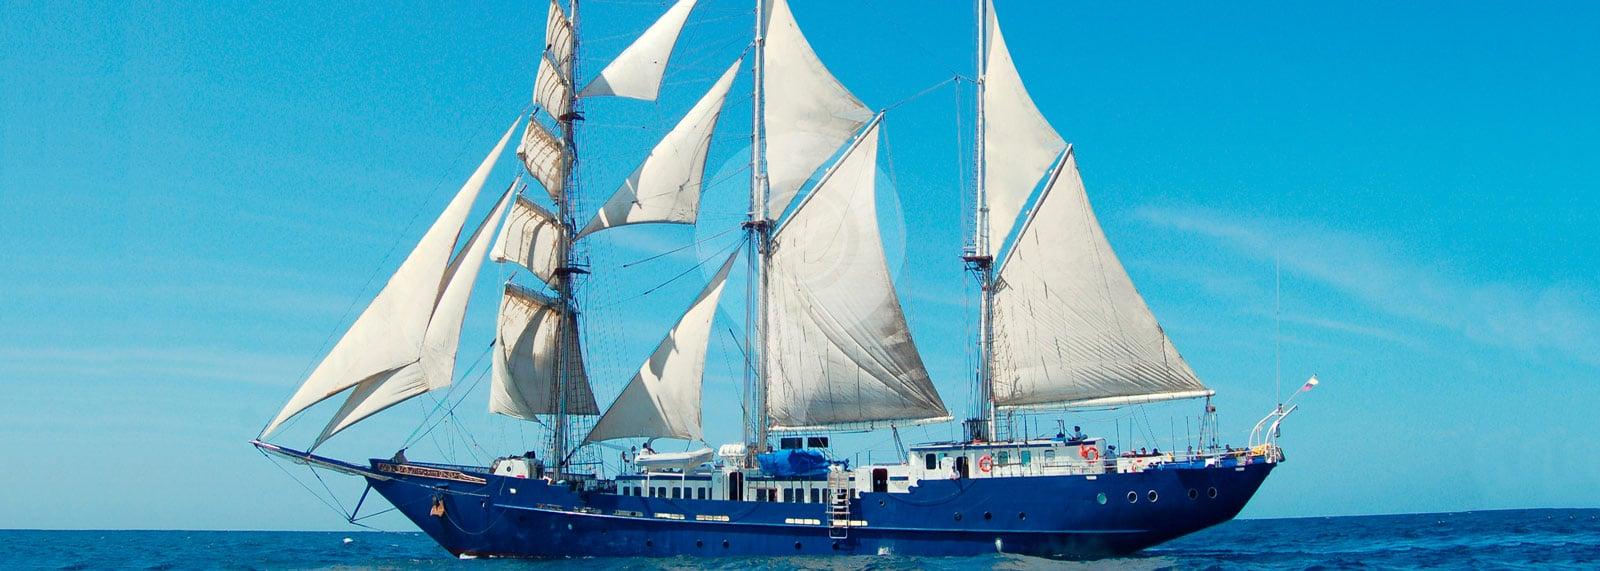 Mary Anne Galapagos Sailboat